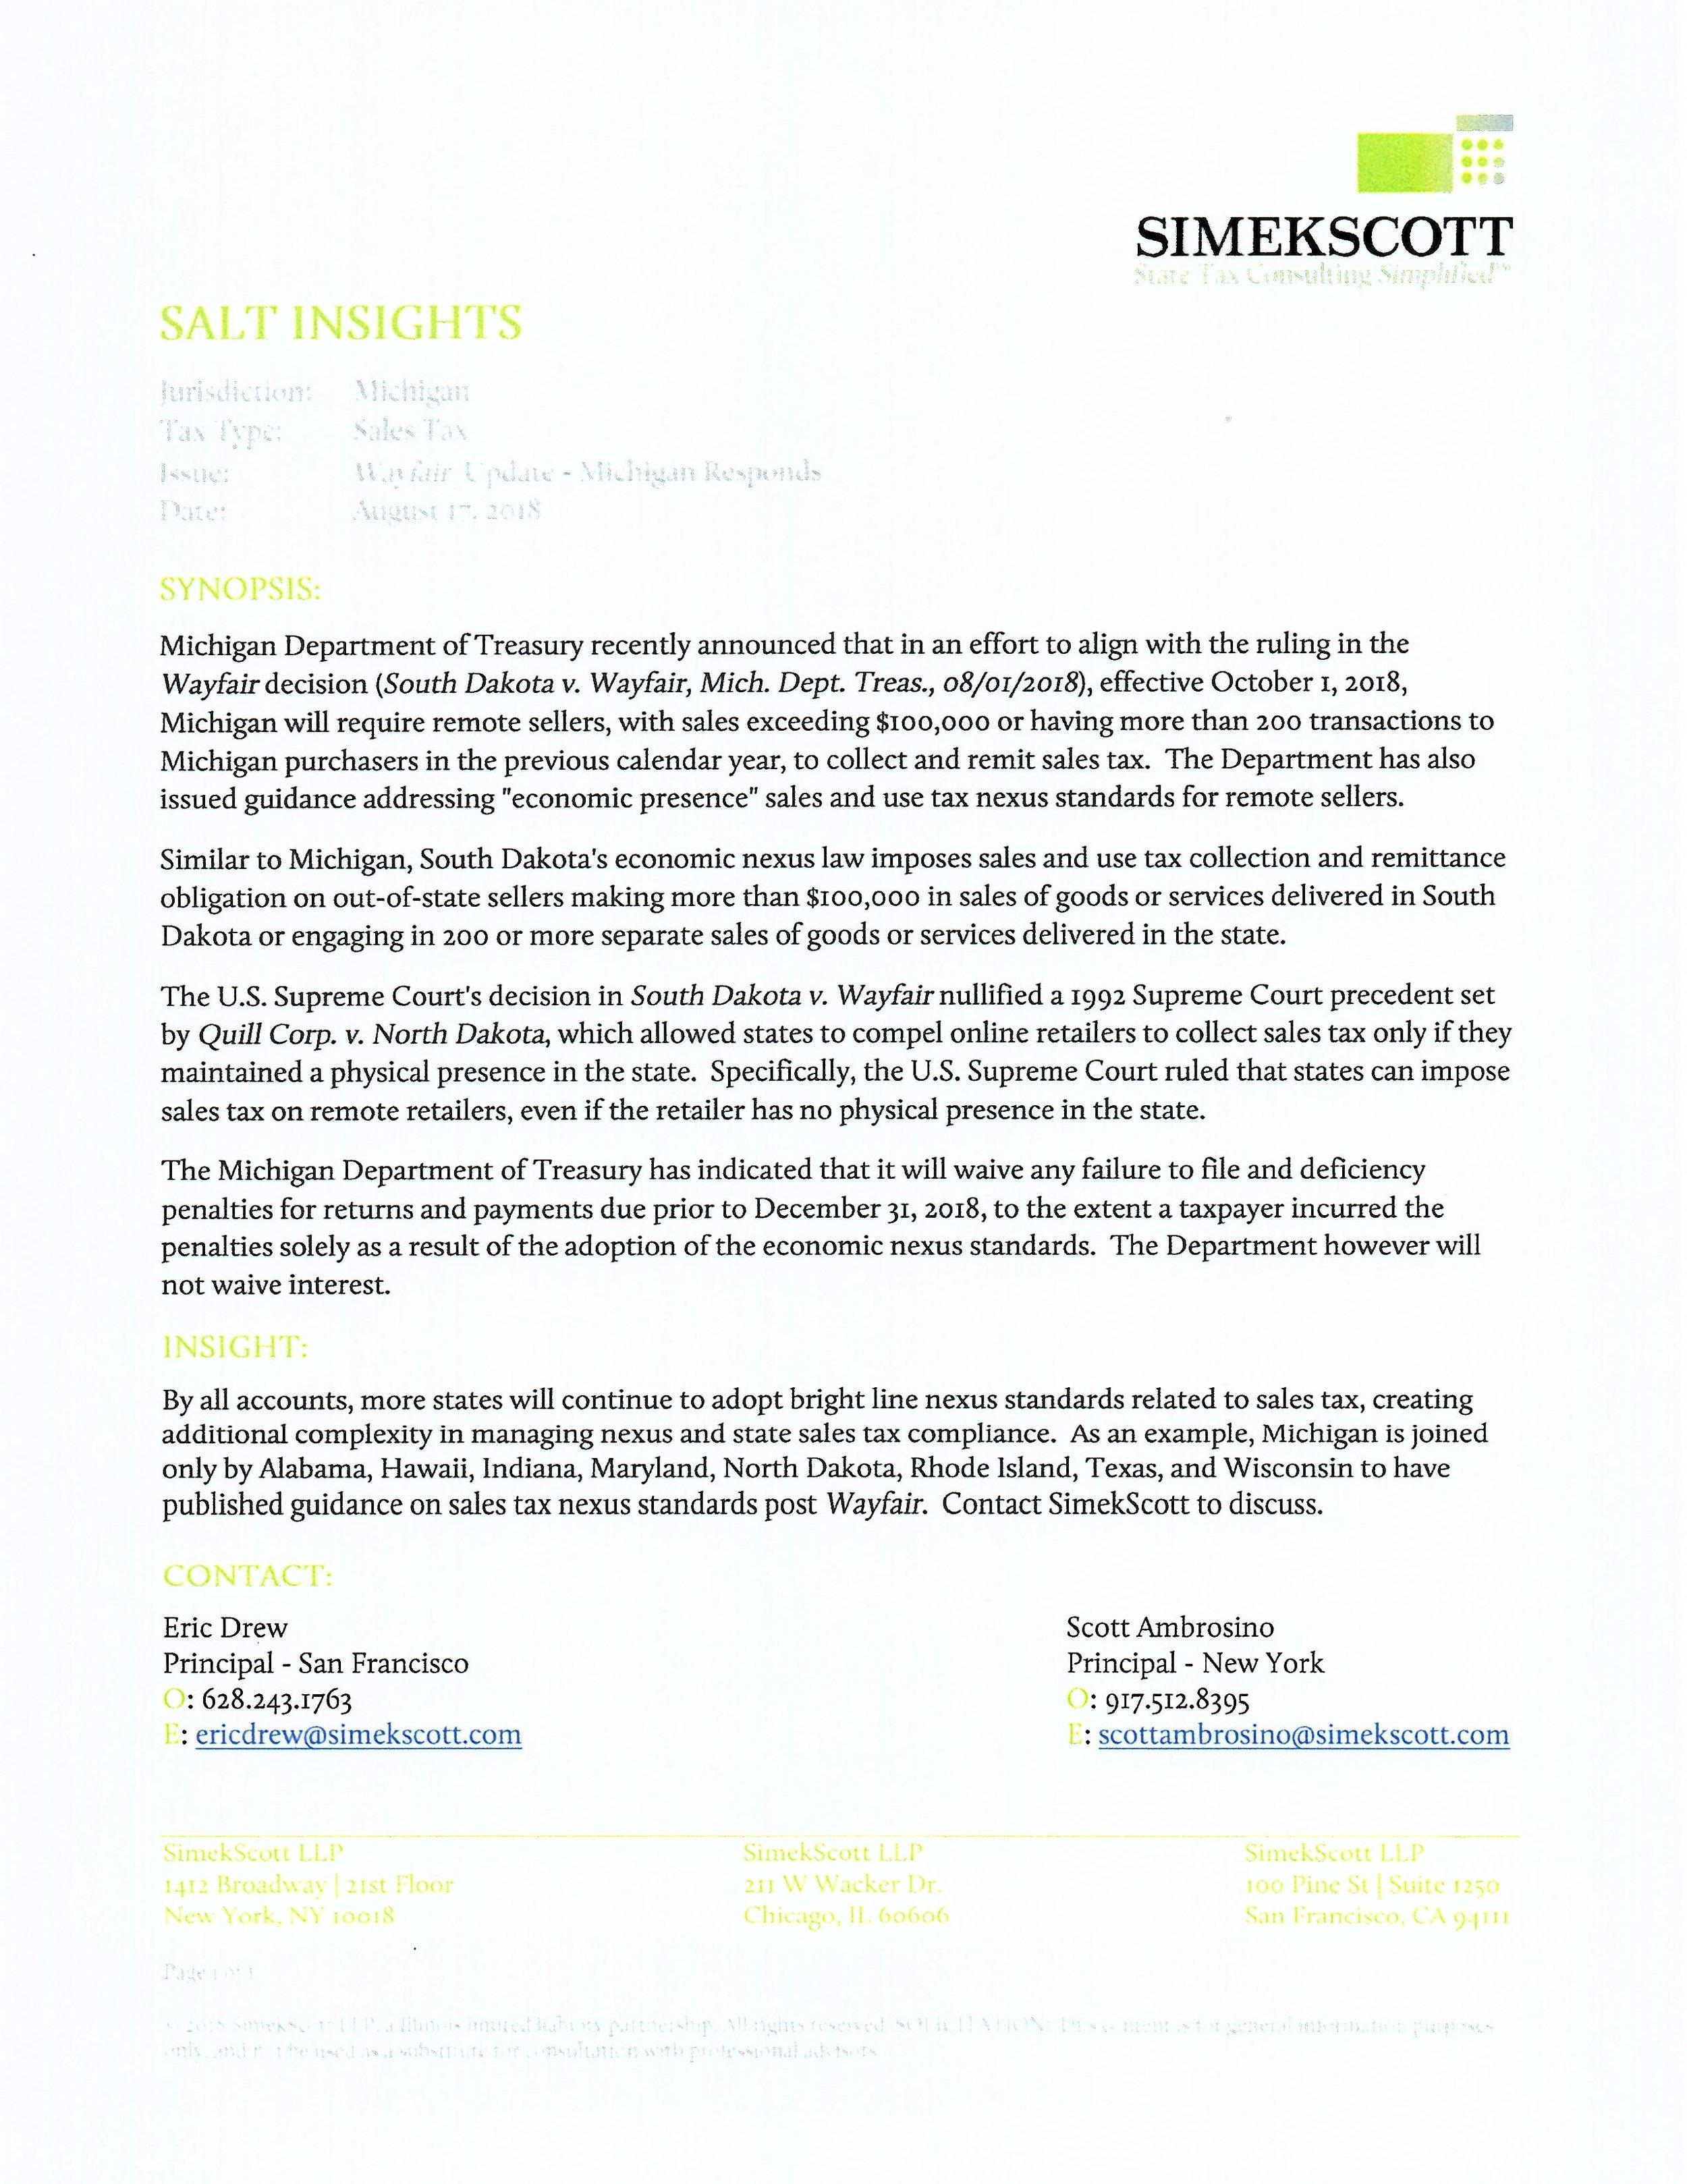 Wayfair_Update_Michigan_Responds.jpg